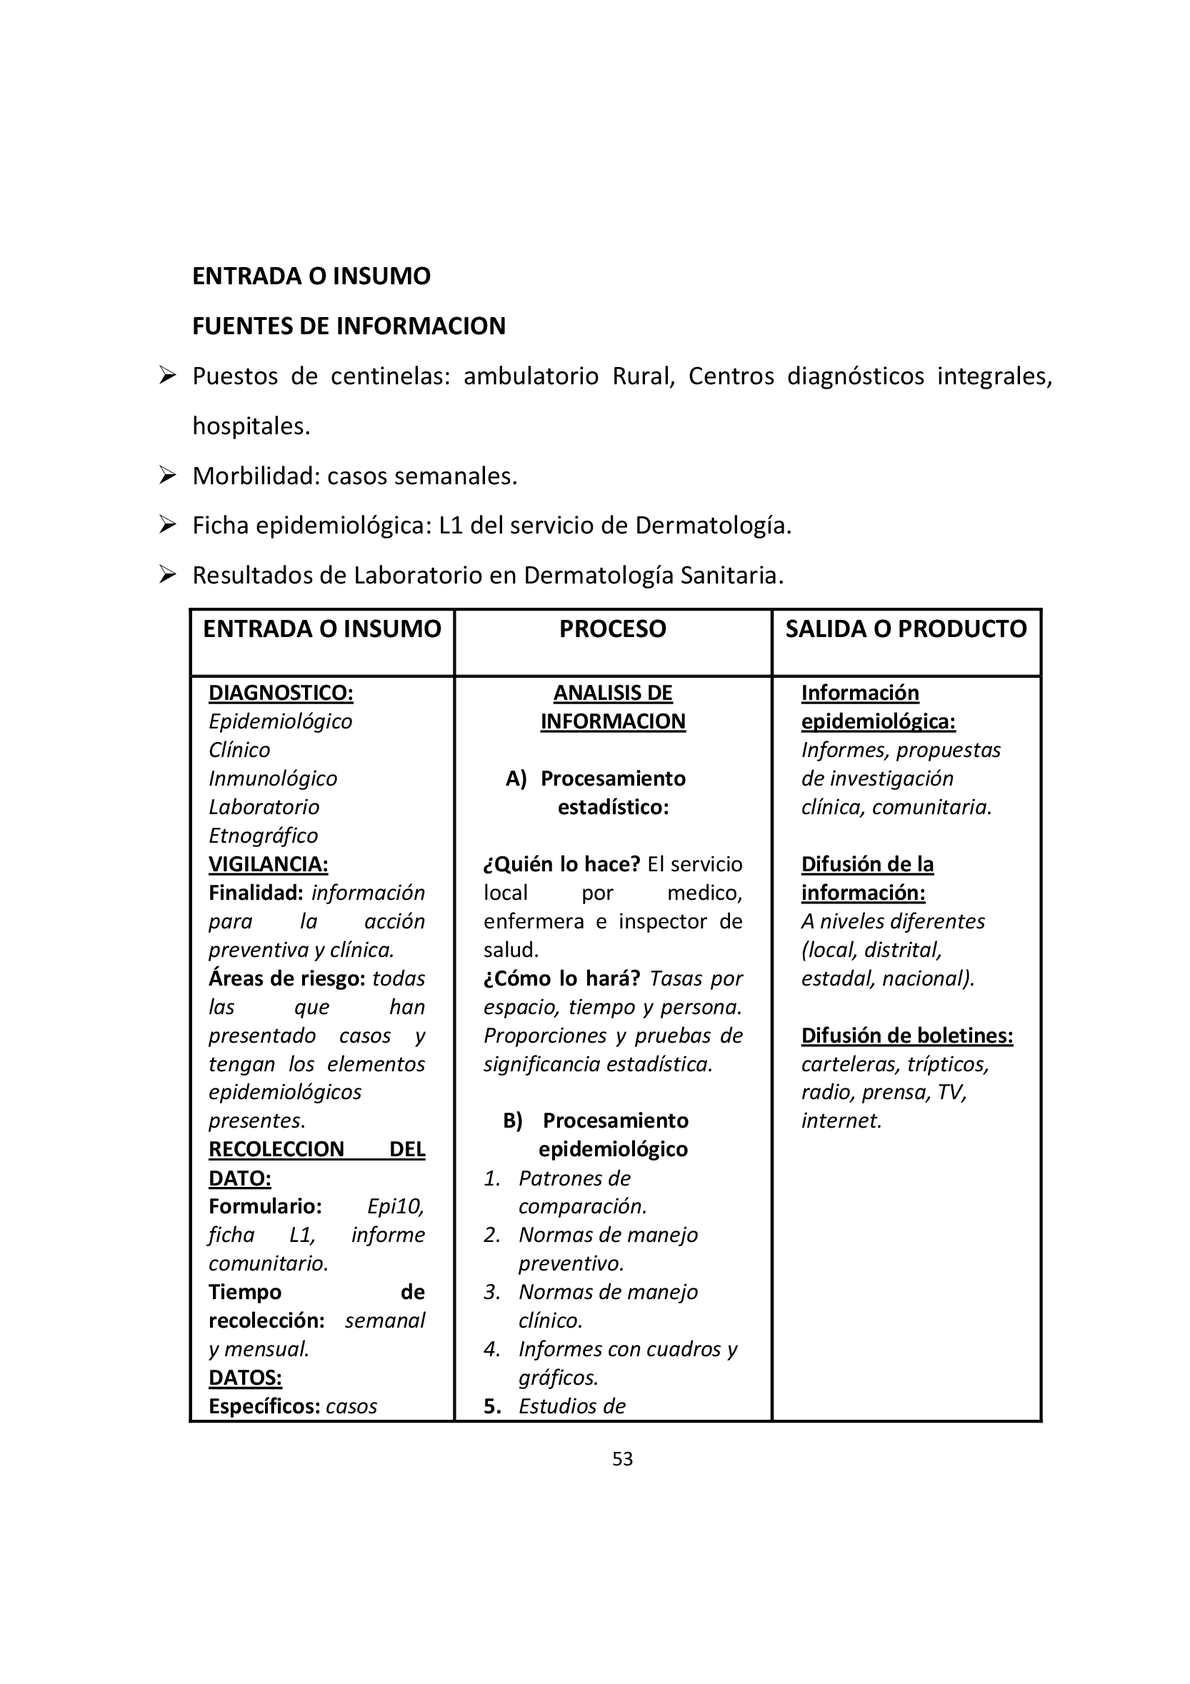 Manual Leishmaniasis cutanea manejo biopsicosocial - CALAMEO Downloader